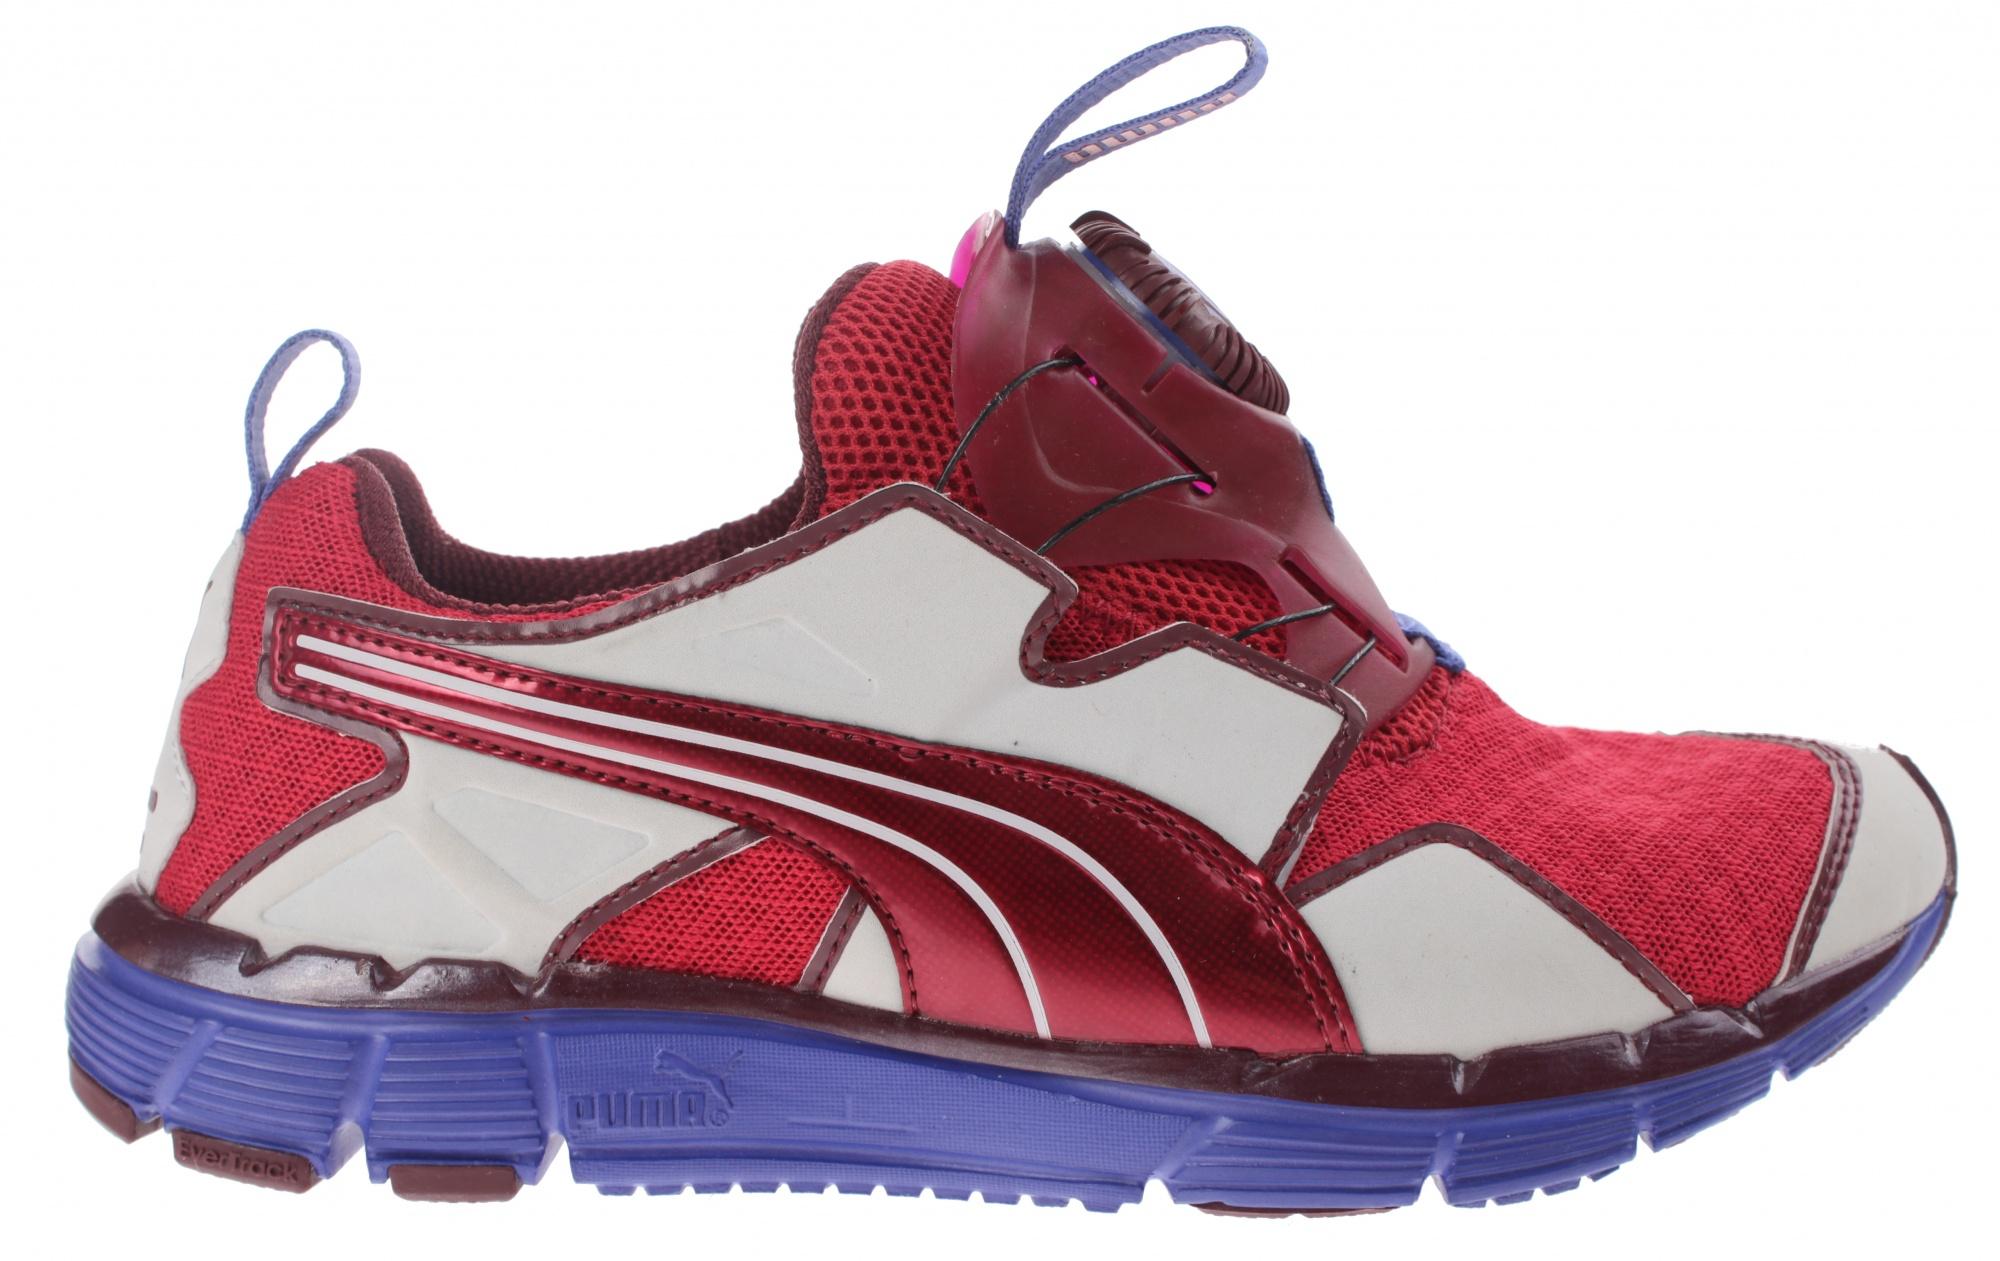 6b67de79759 Puma sneakers Disc Ltwt 2.0 red / white - Internet-Sport&Casuals